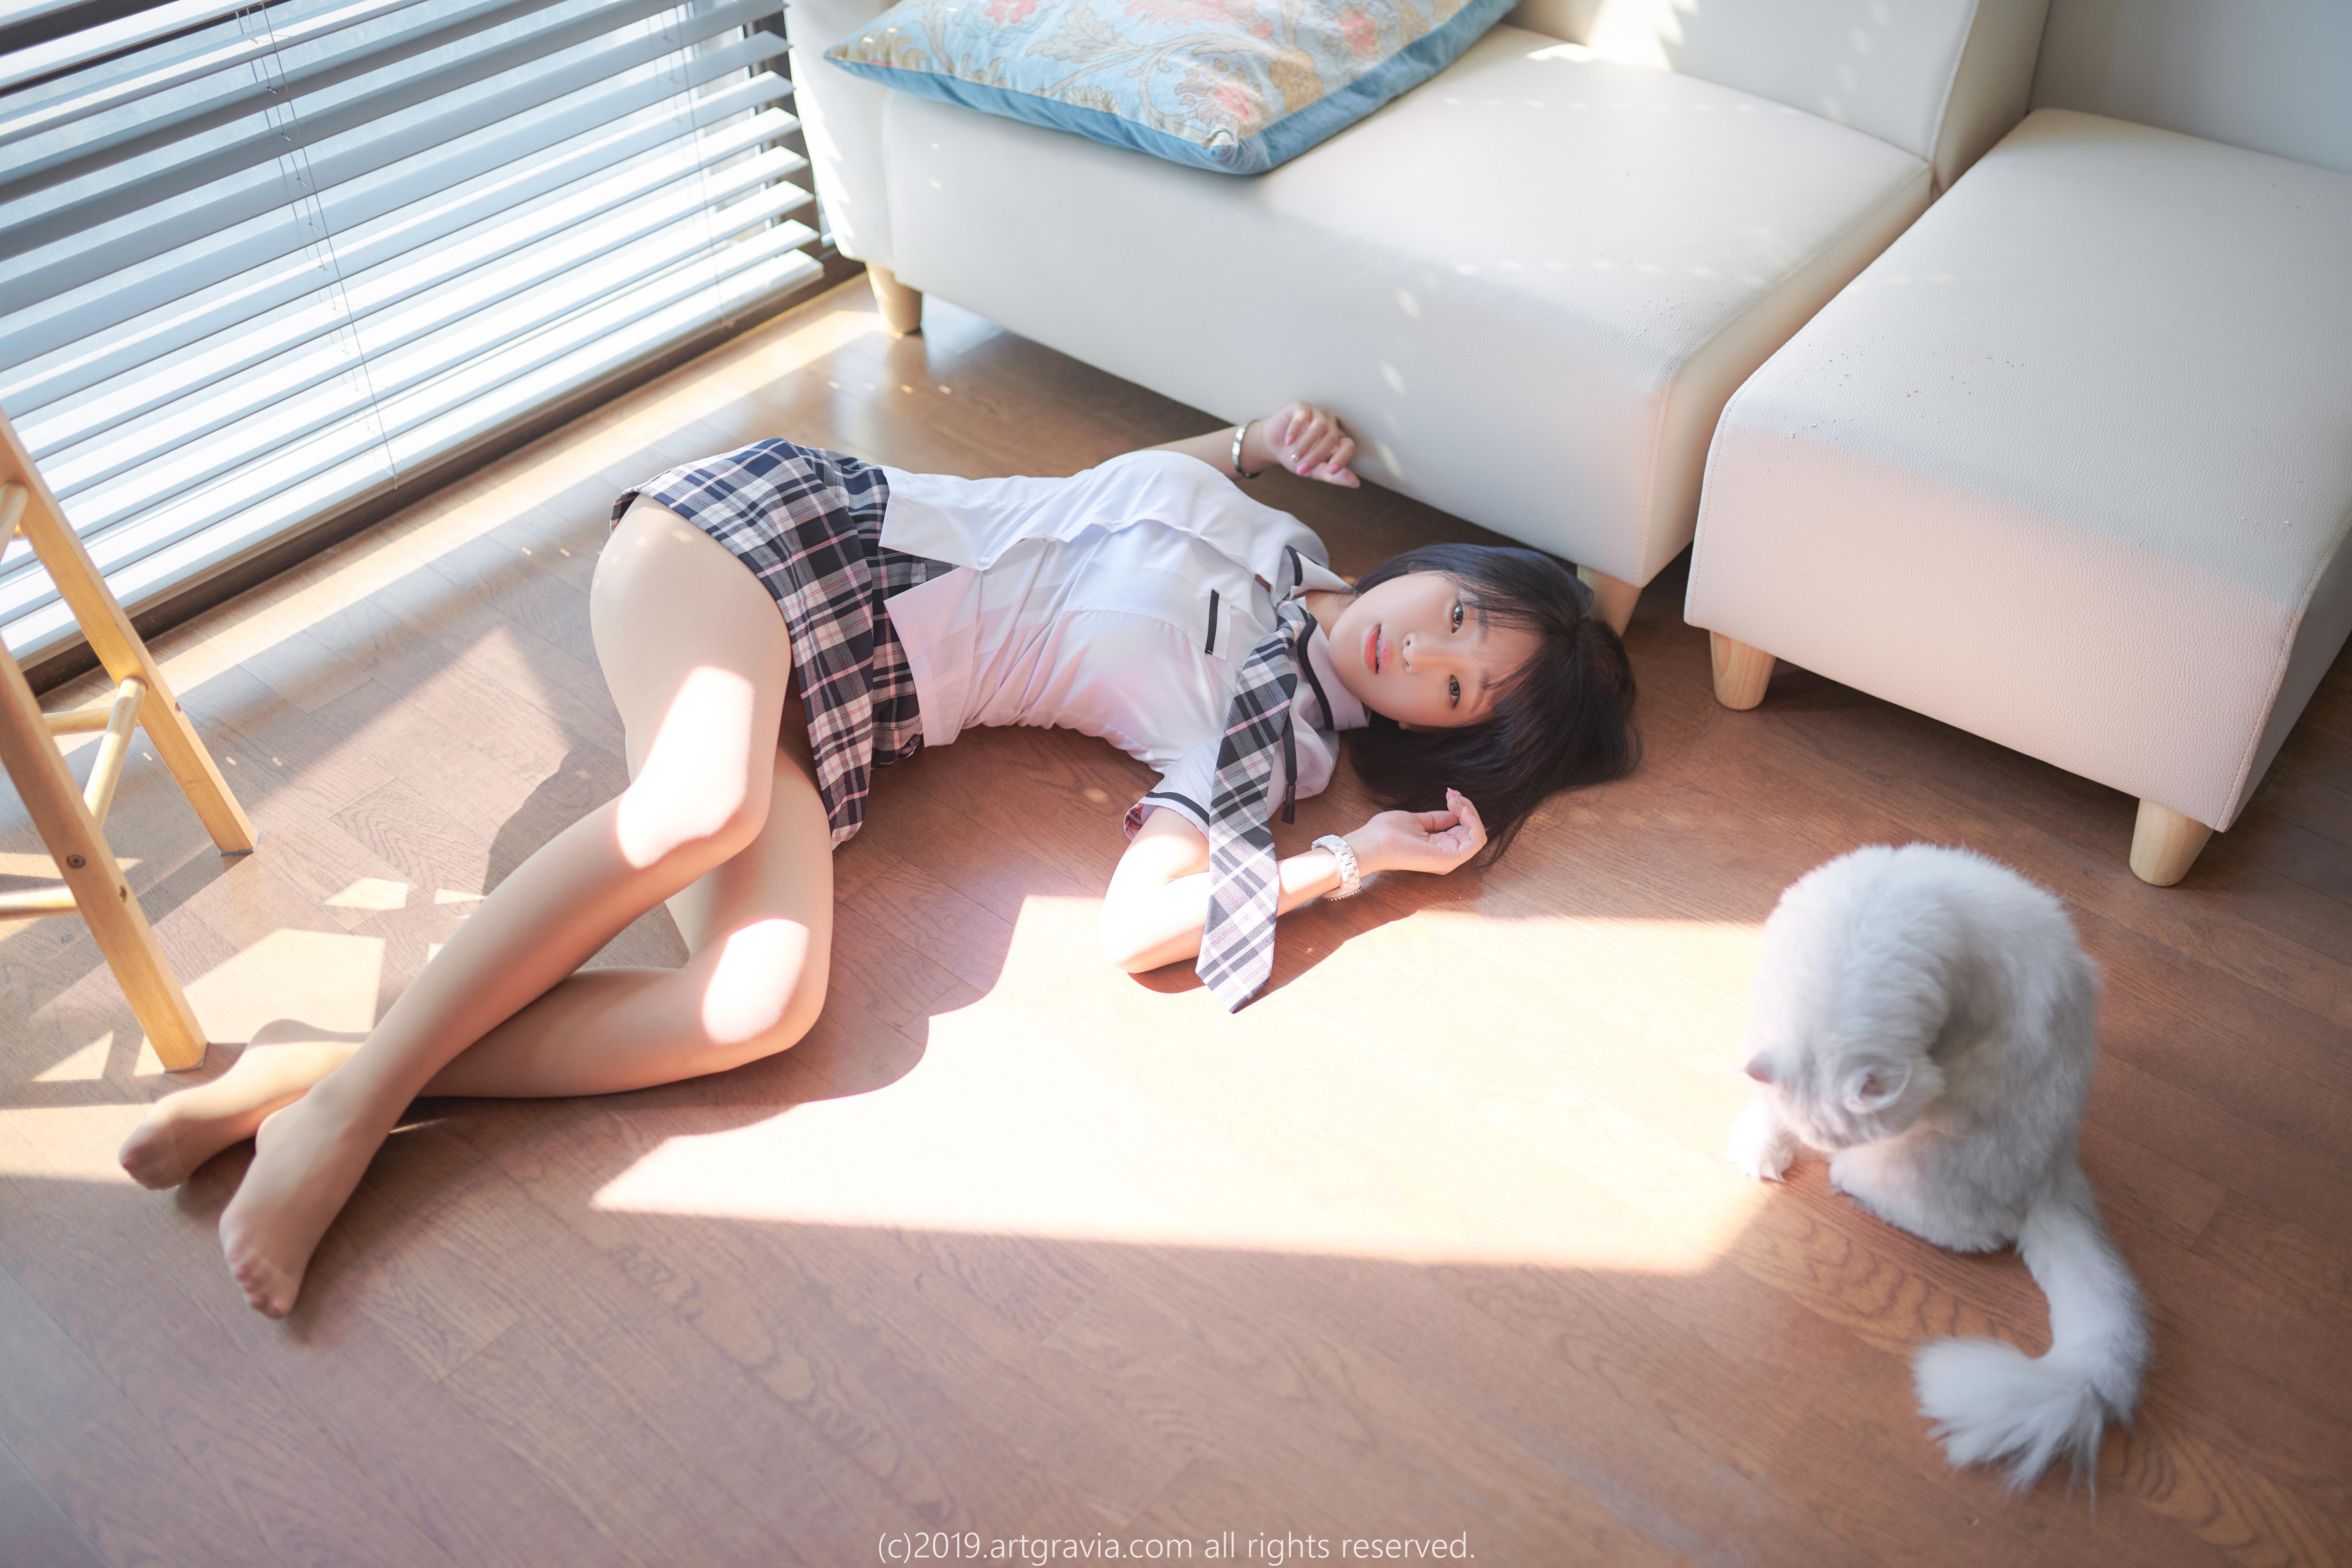 Korean Women Dark Hair White Bed Sheets Asian Indoors Women Cats 5000x3333